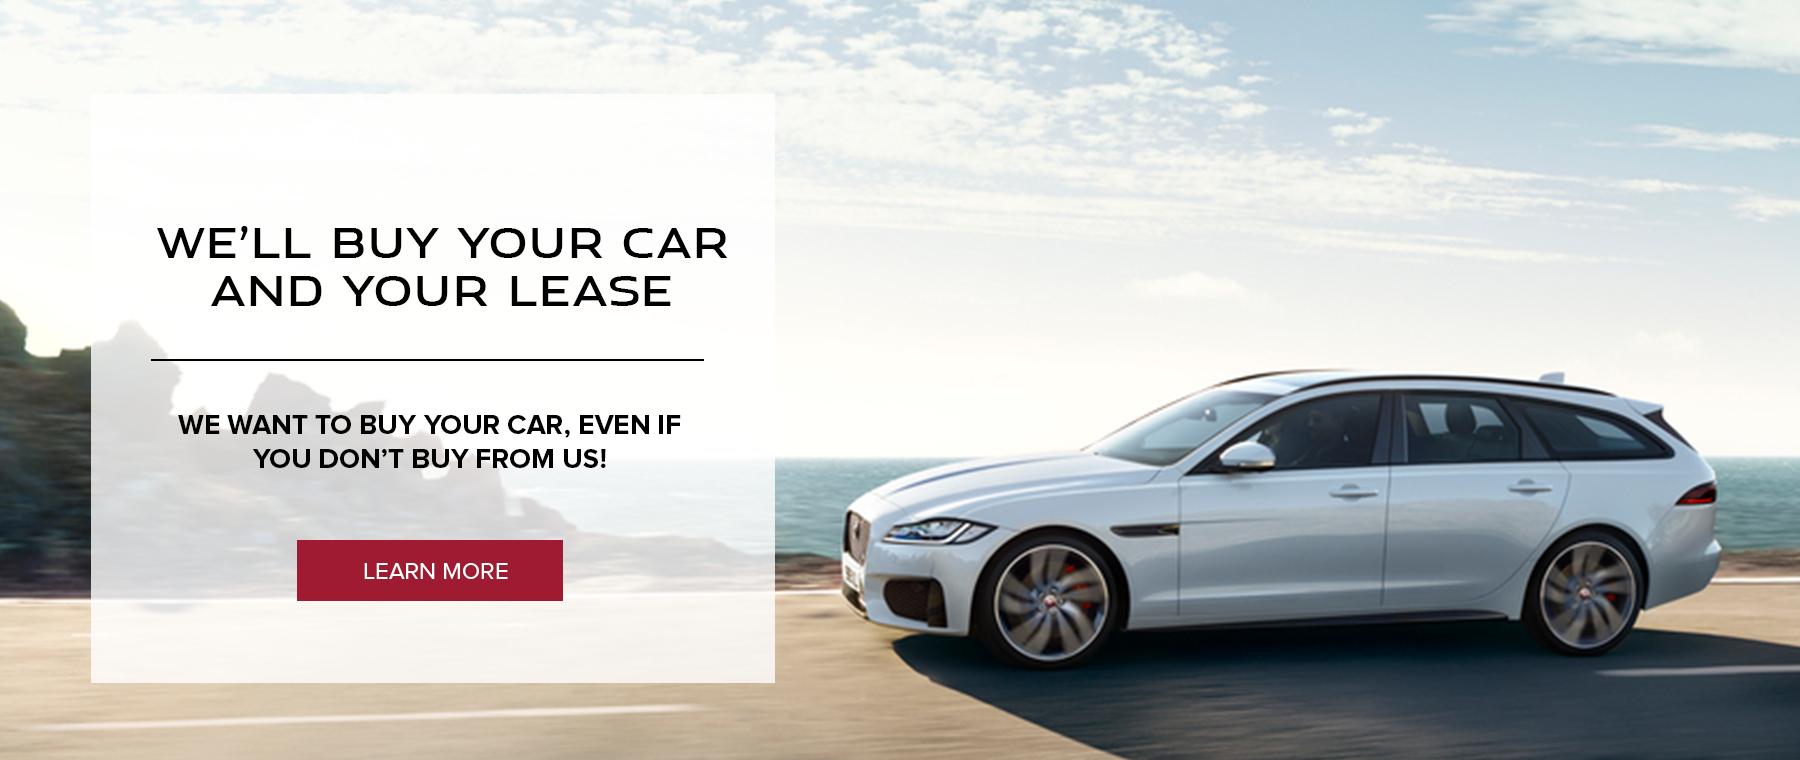 Jaguar. We'll Buy Your Lease. Value Your Car.